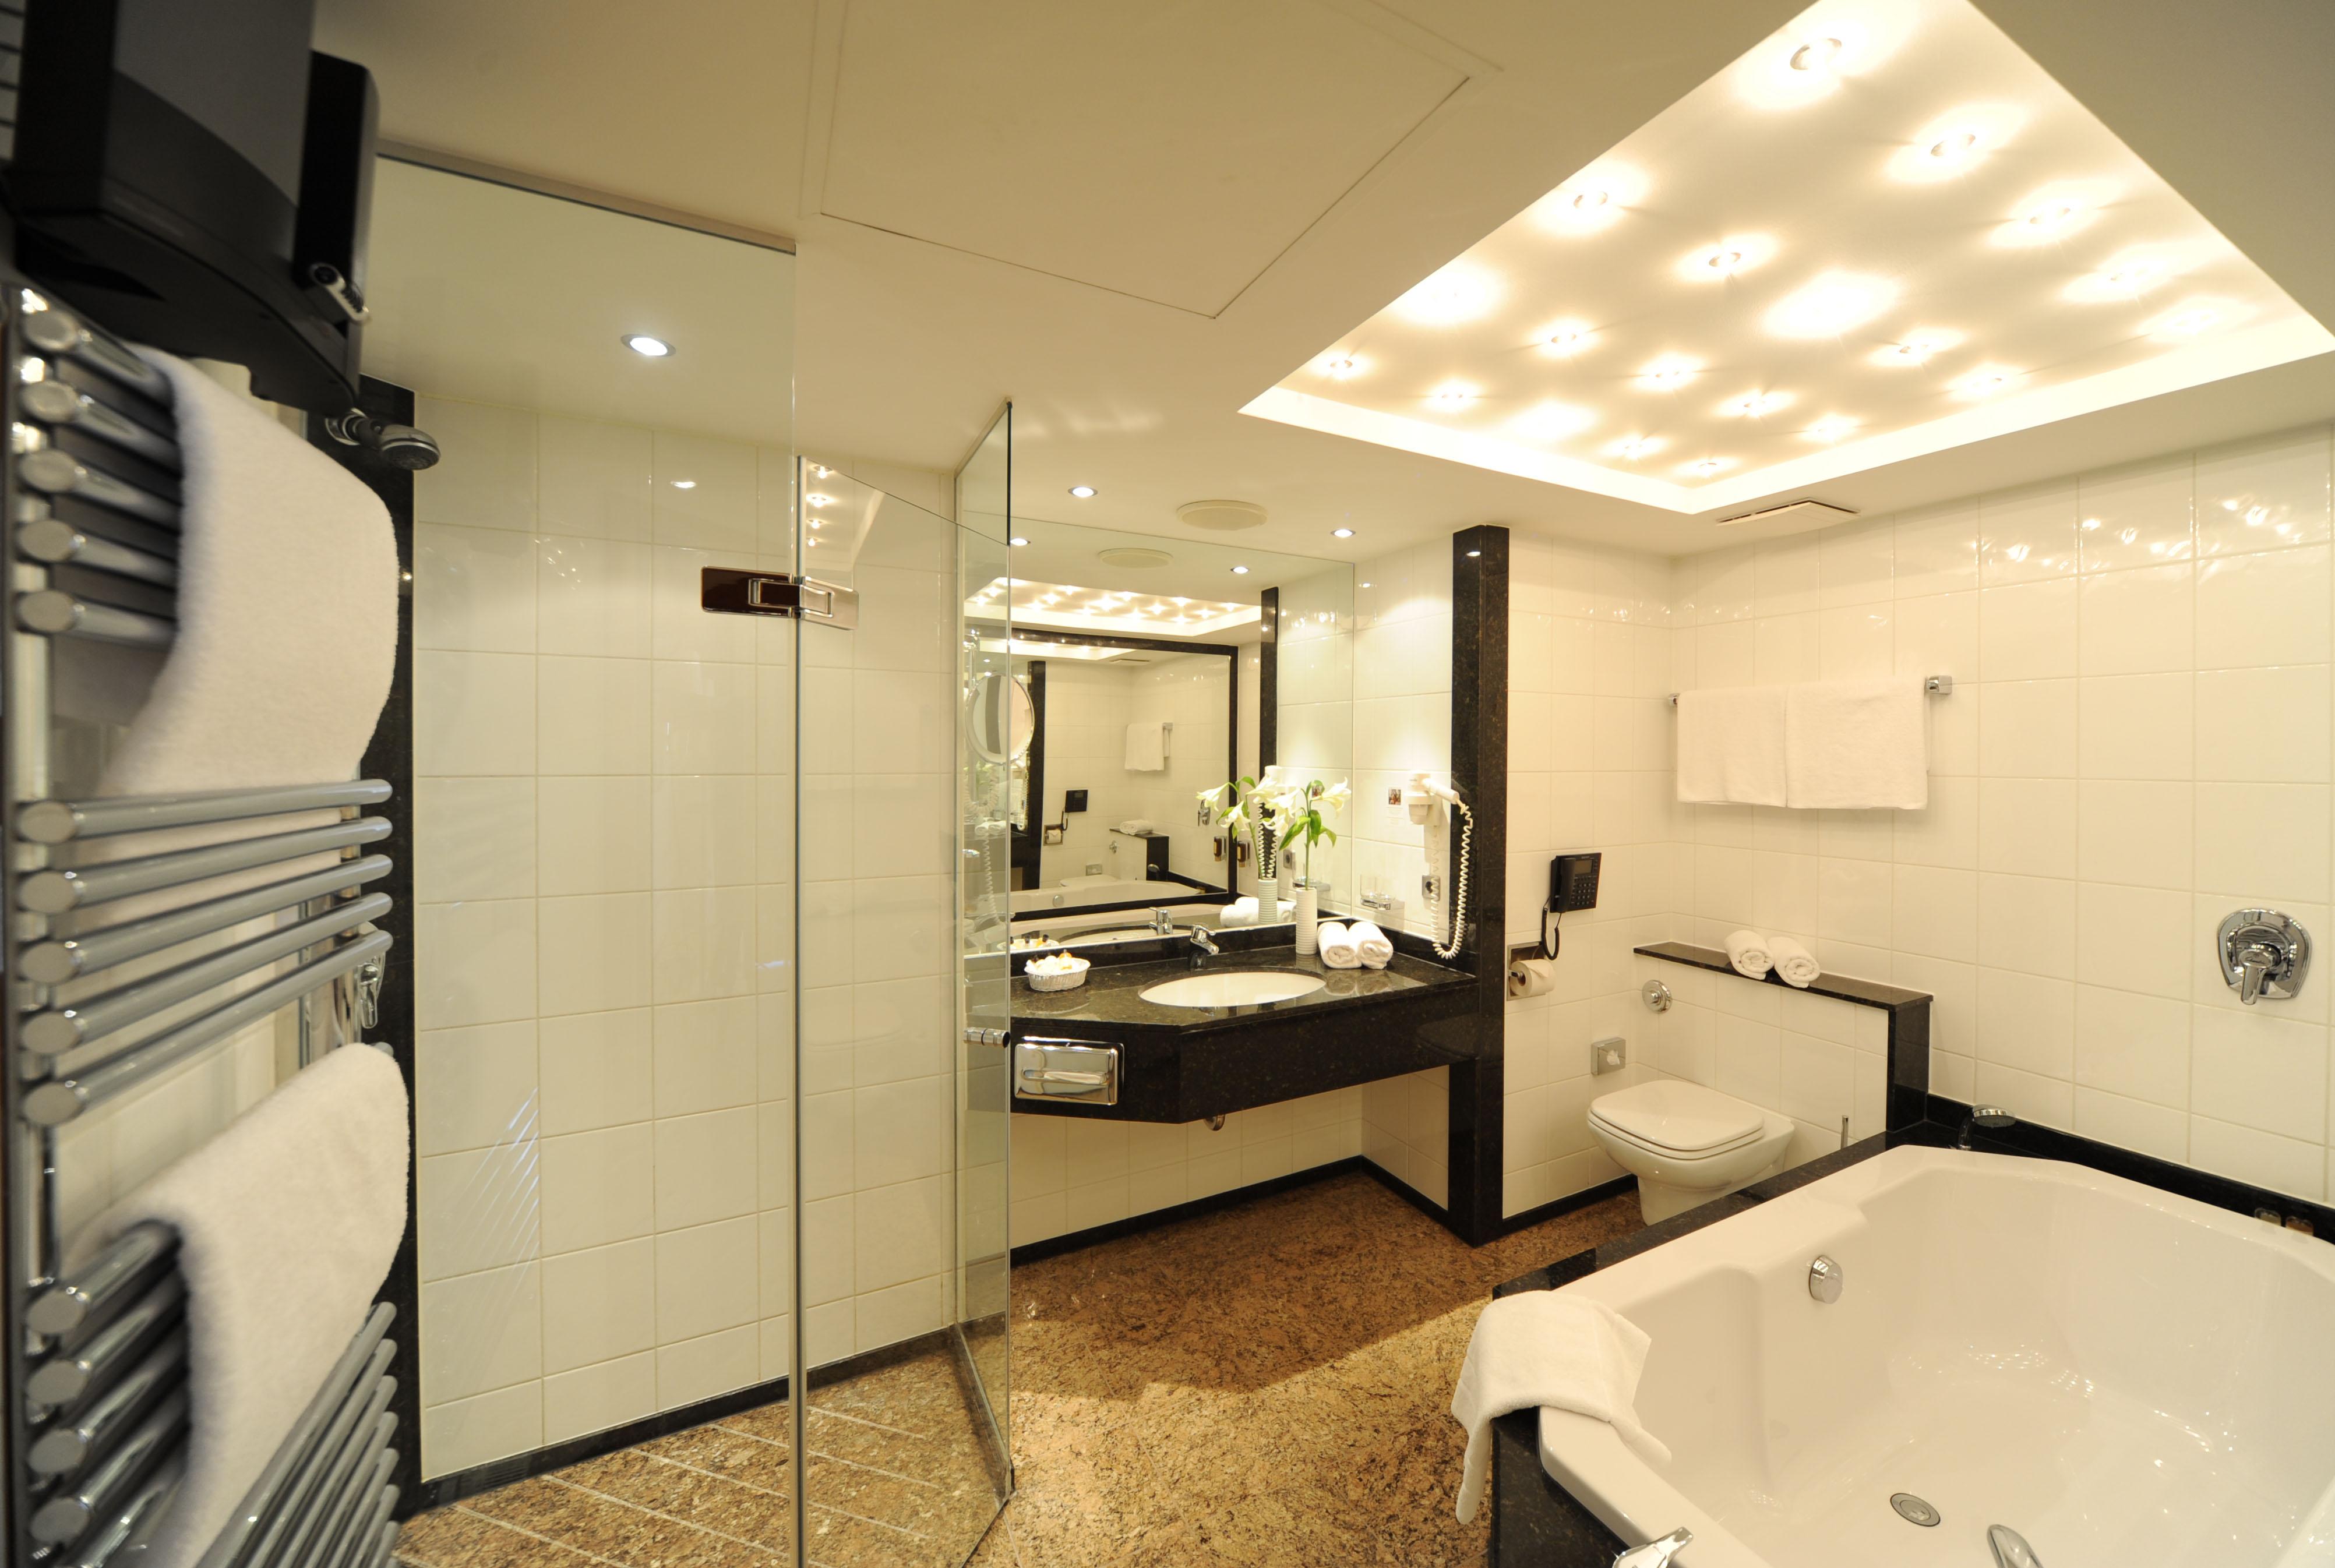 awesome badezimmer berlin ausstellung photos - amazing design